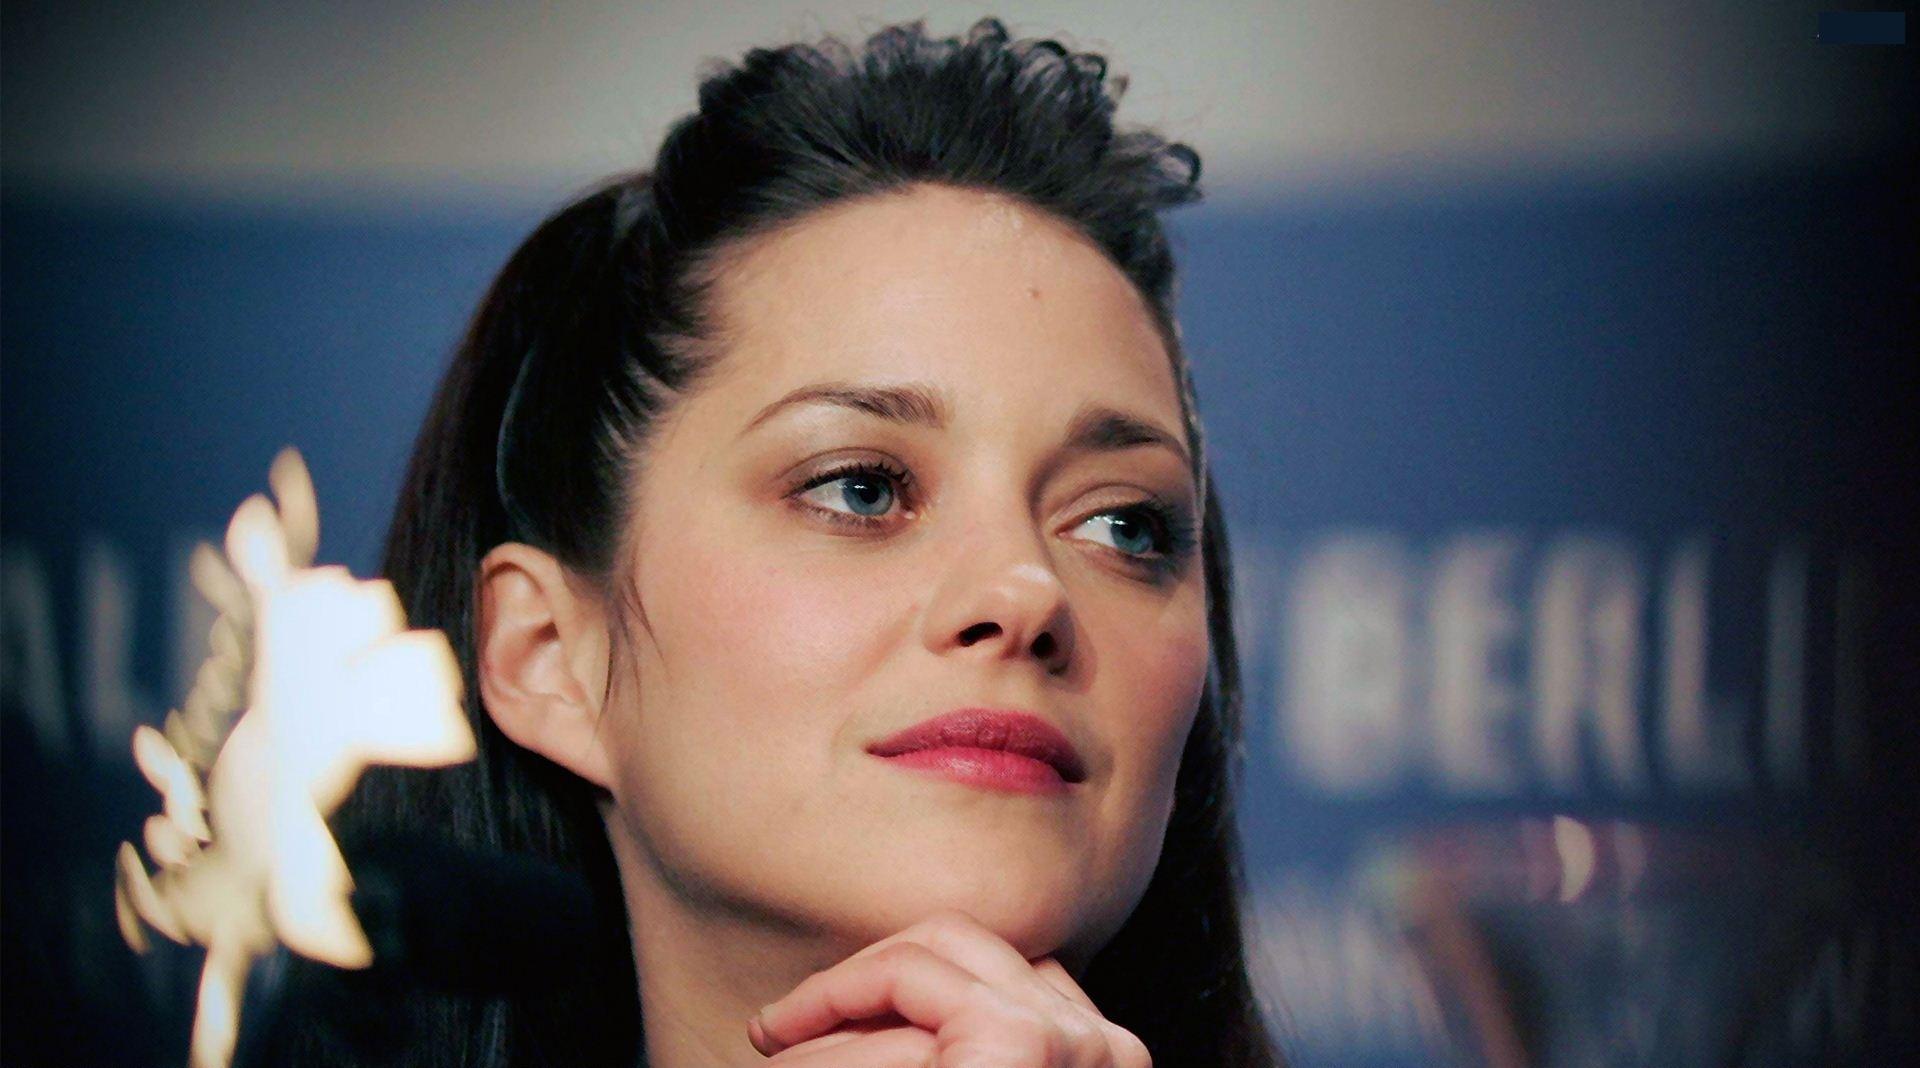 Hollywood actress hd hot marion cotillard cute face stills